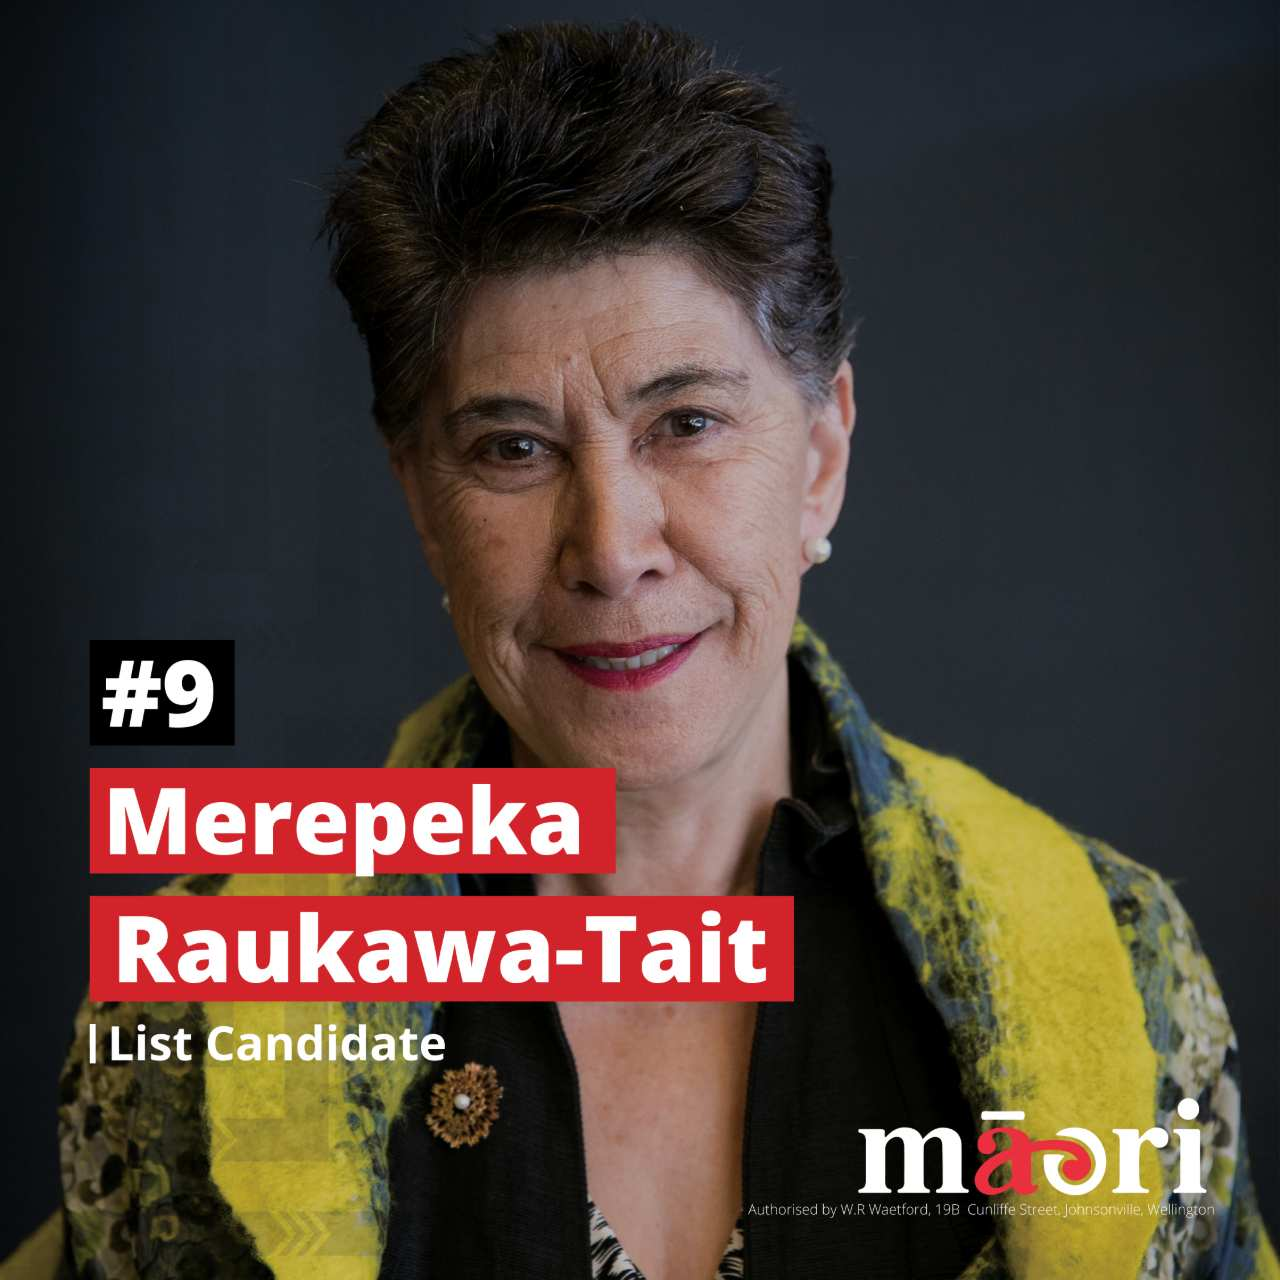 Merepeka Raukawa-Tait, List Candidate